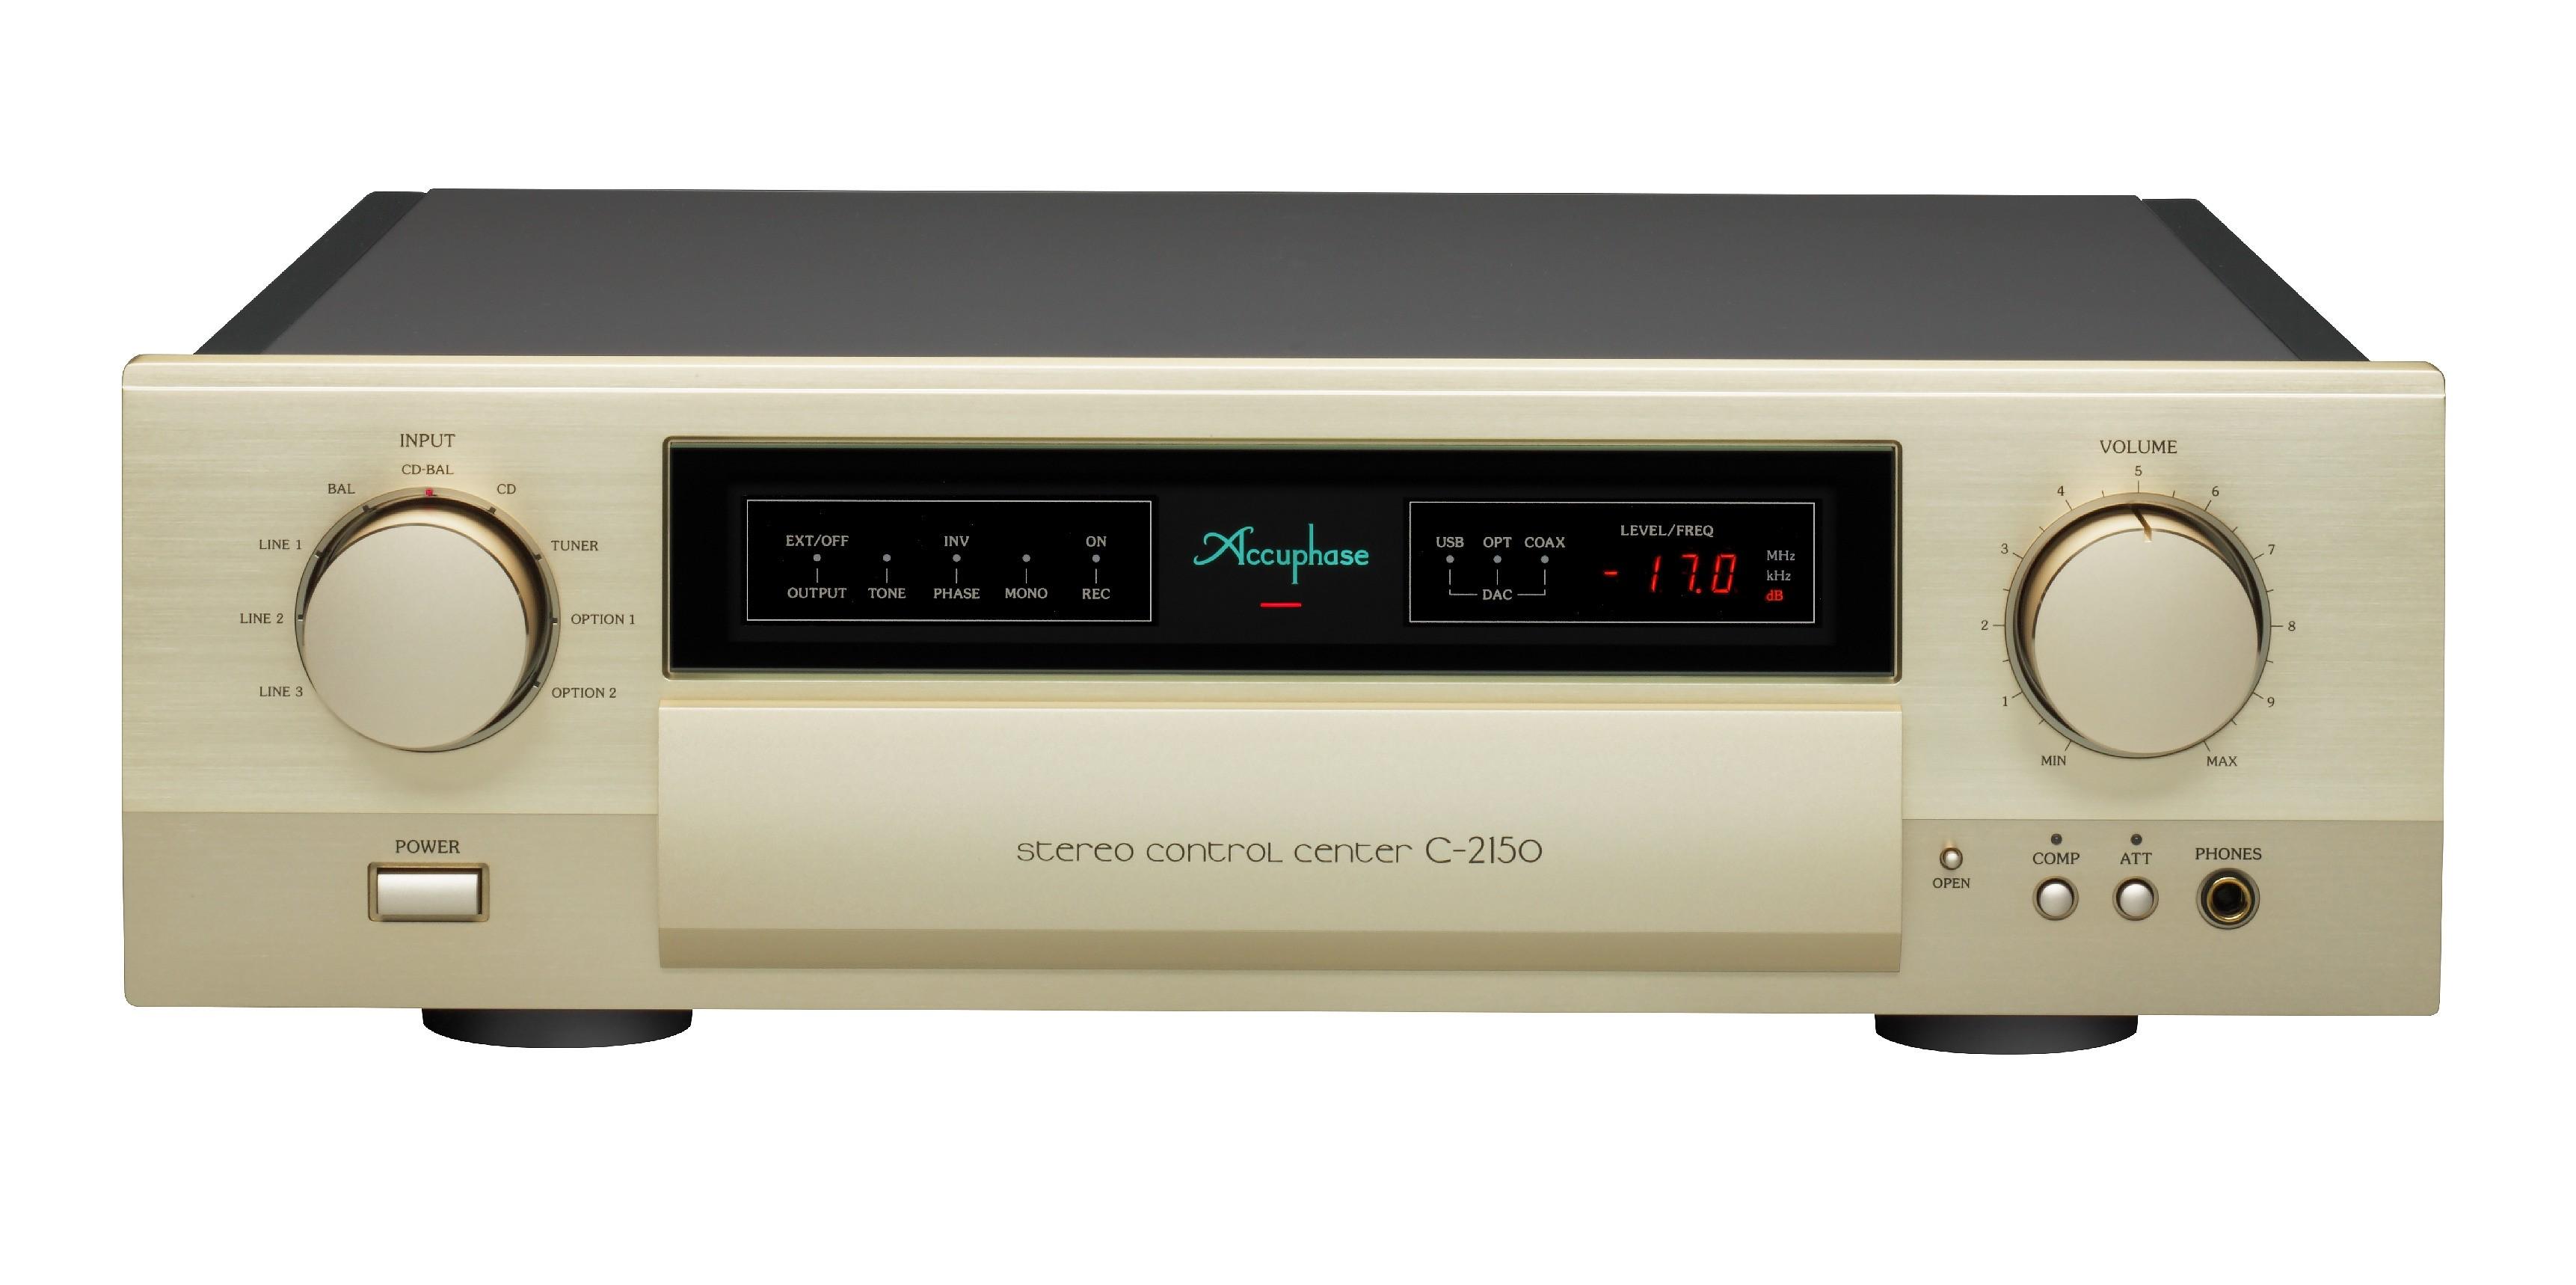 C 2150